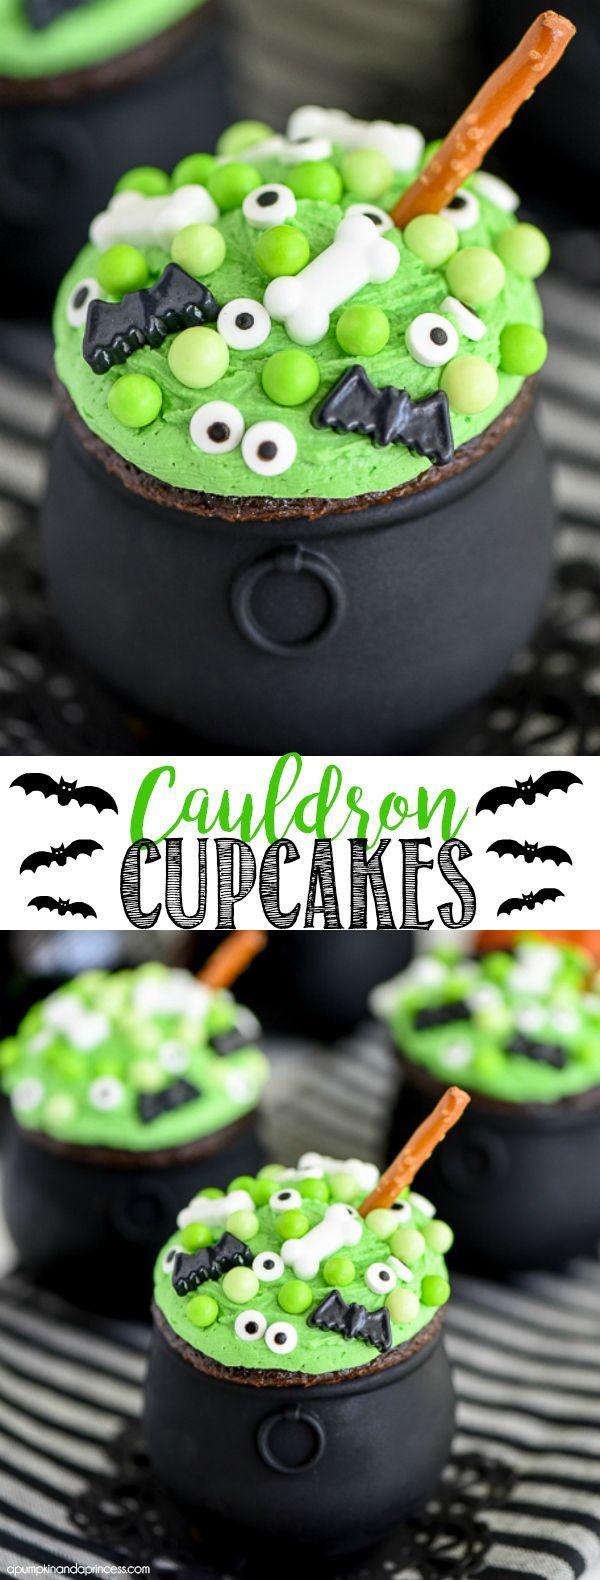 Cauldron Cupcakes                                                                                                                                                                                 More